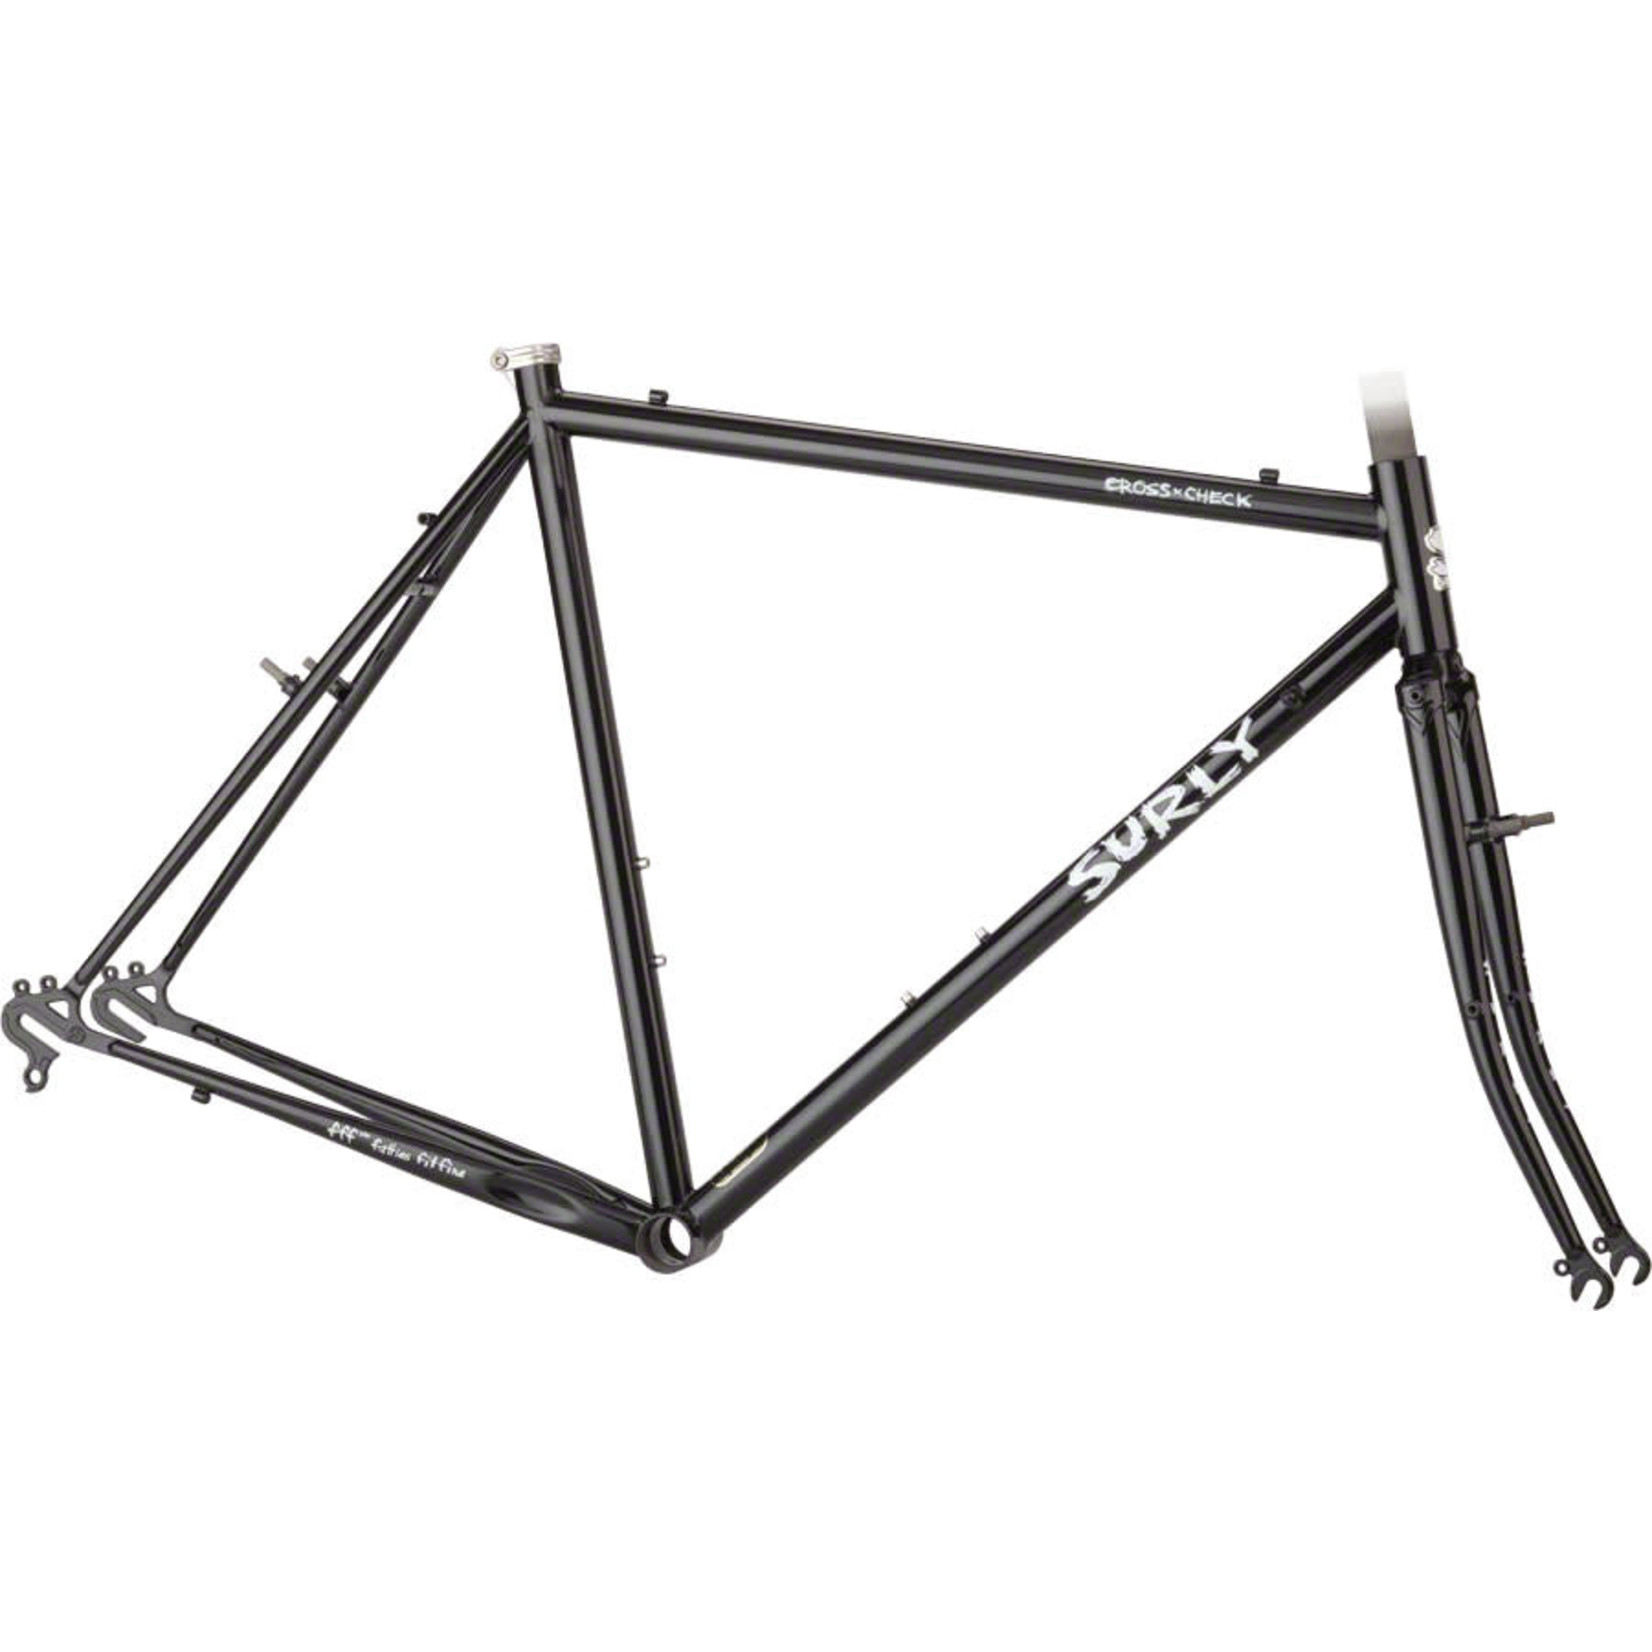 Surly Surly Cross Check 58cm Frameset Gloss Black